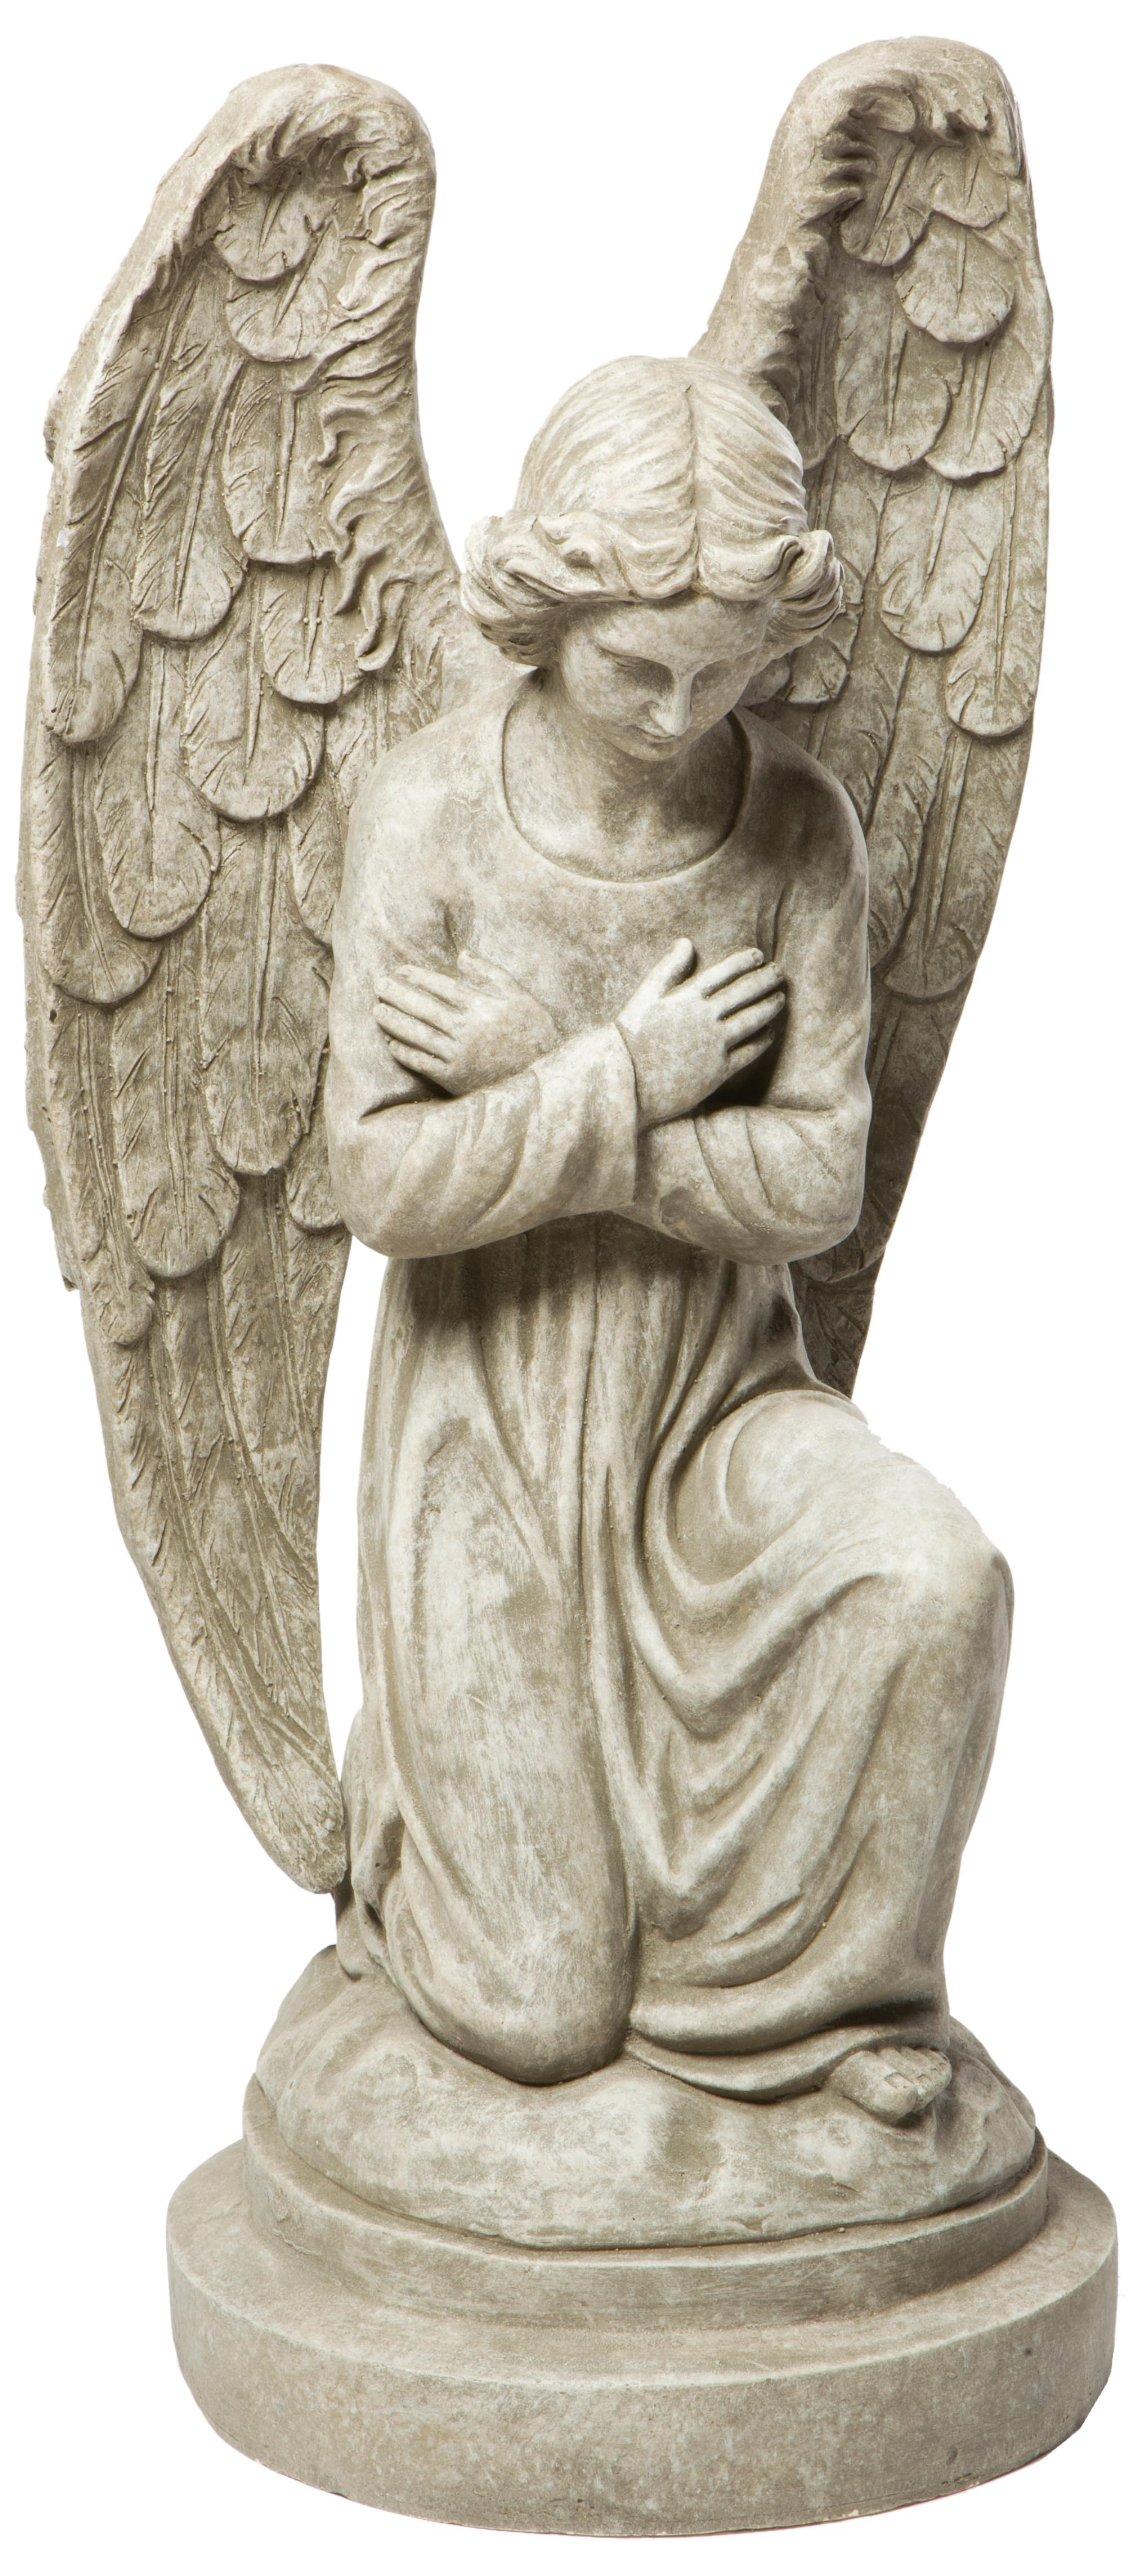 Alfresco Home Kneeling Angel Statuary, Antique Granite